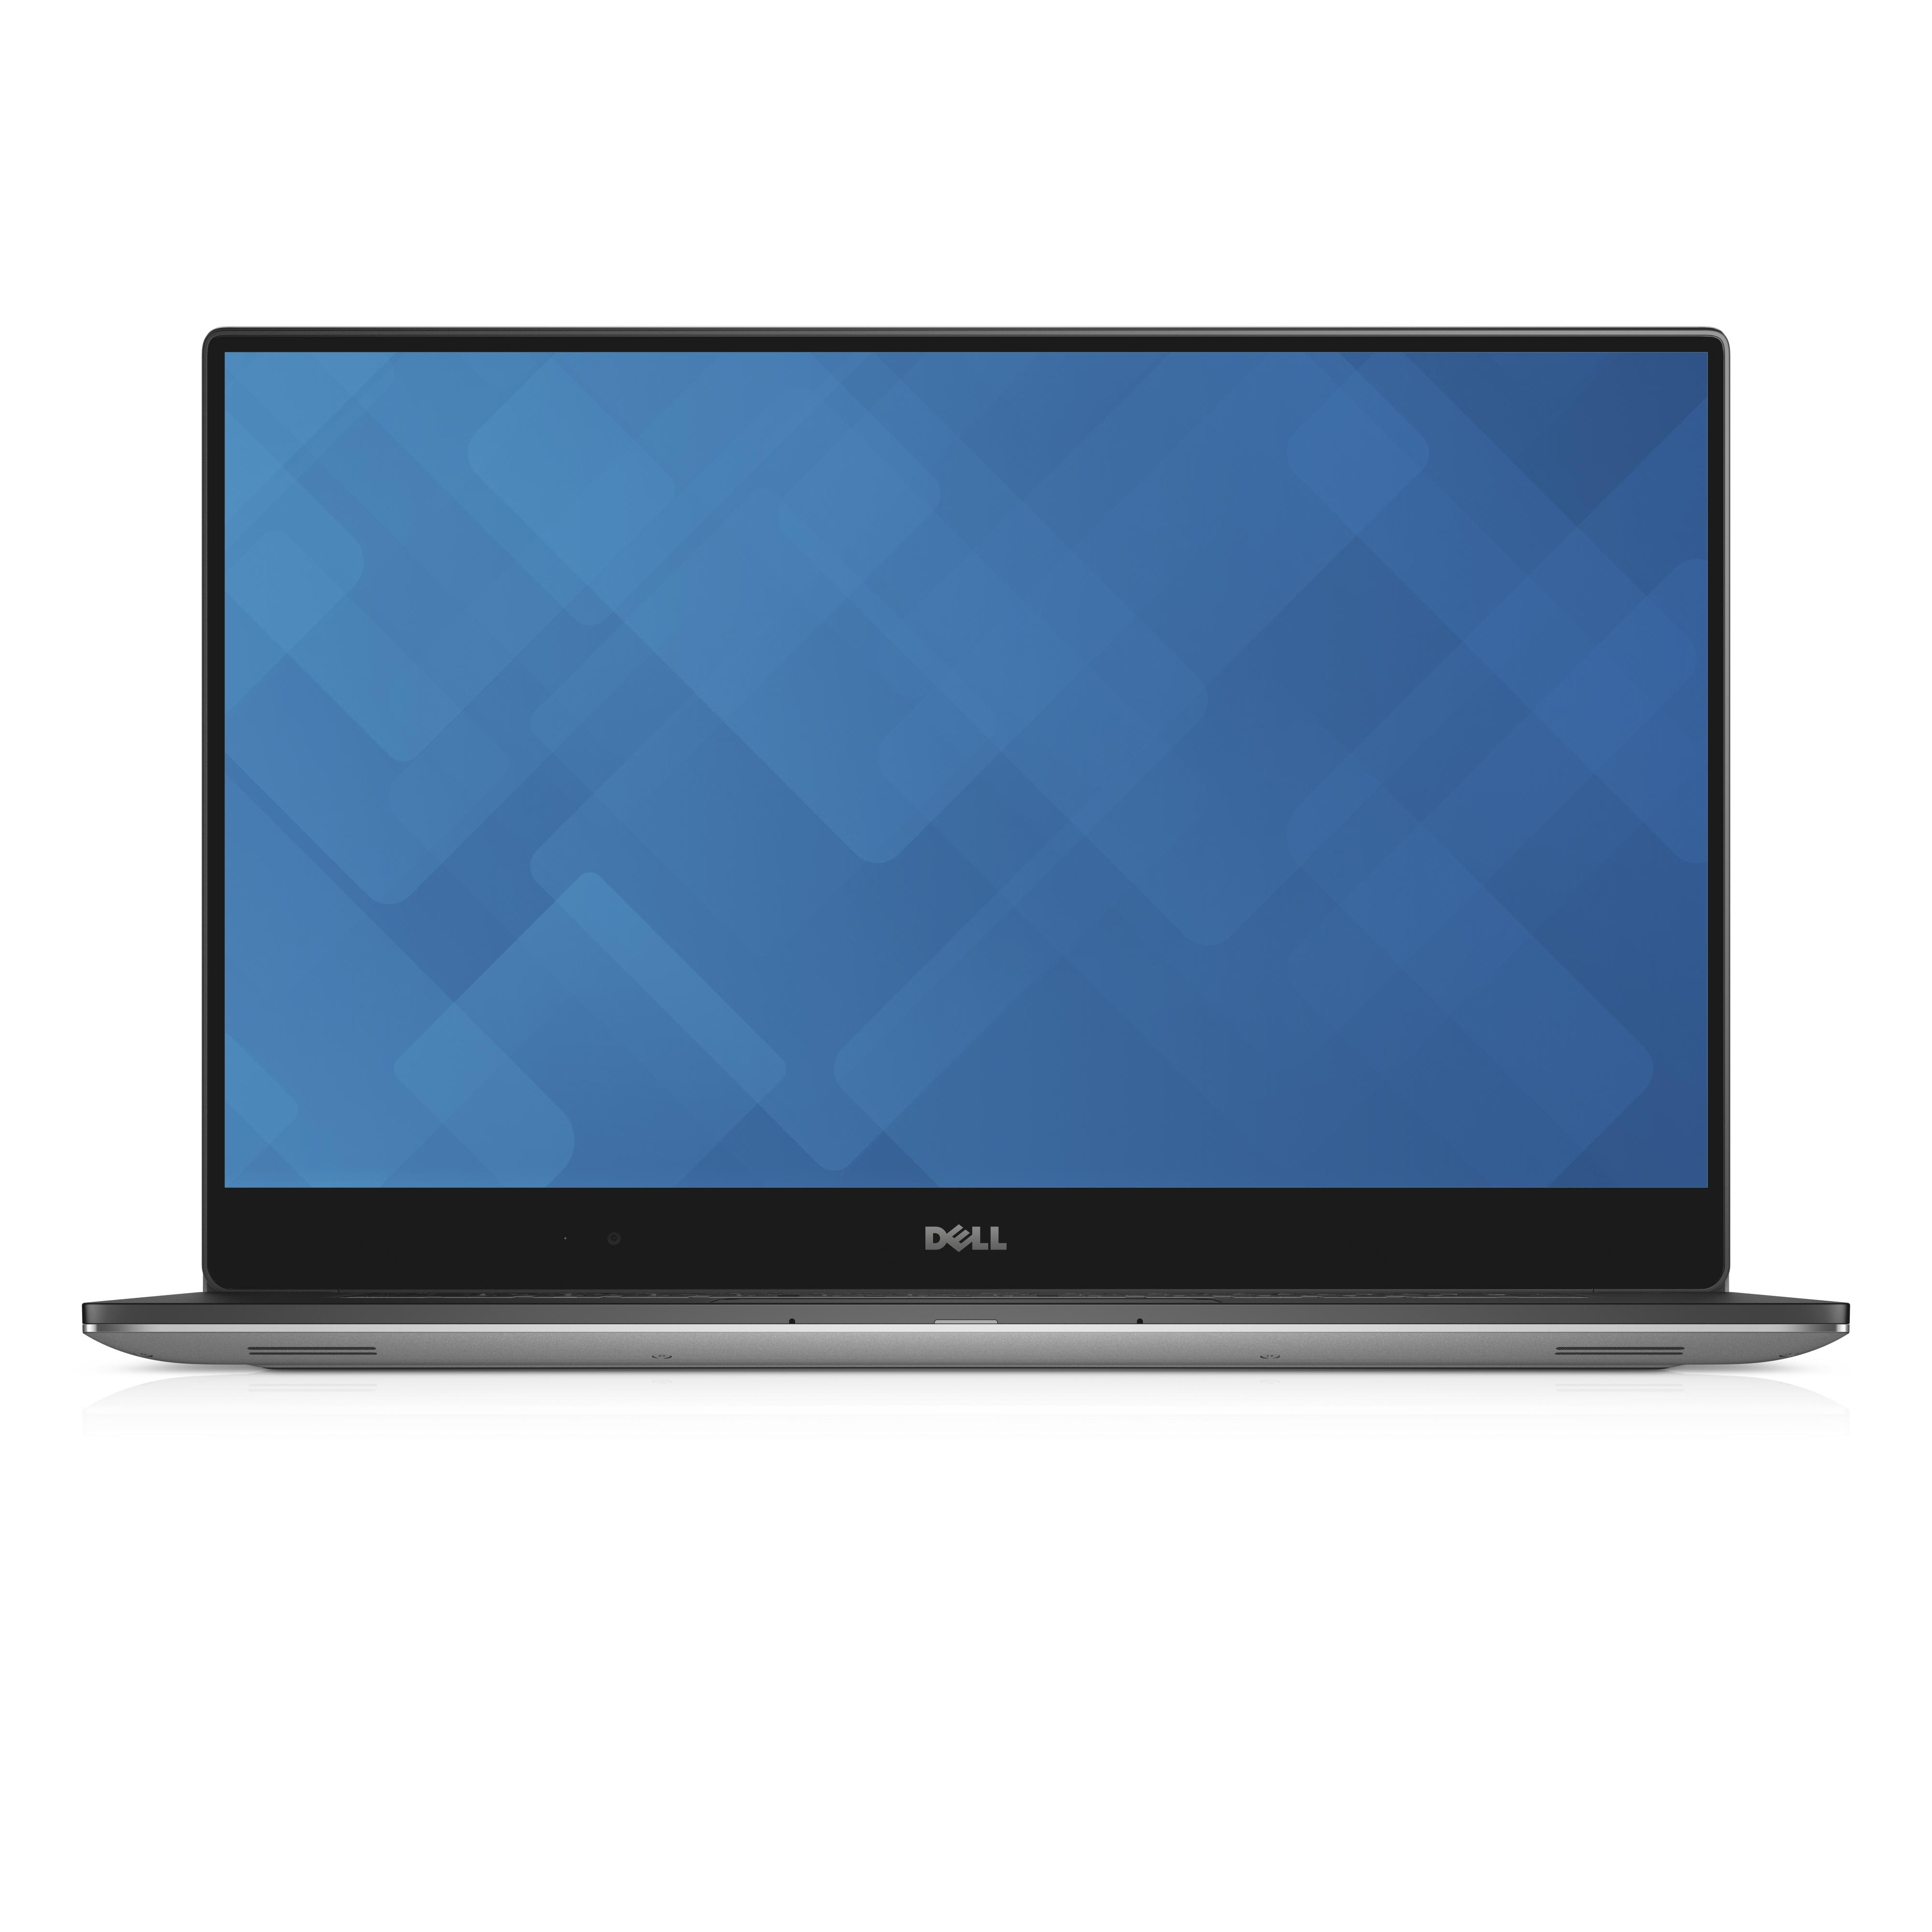 Notebook Dell Precision 5520 15.6 Ultra HD Touch Intel Xeon E3-1505M v6 M1200M-4GB RAM 16GB SSD 512GB Windows 10 Pro